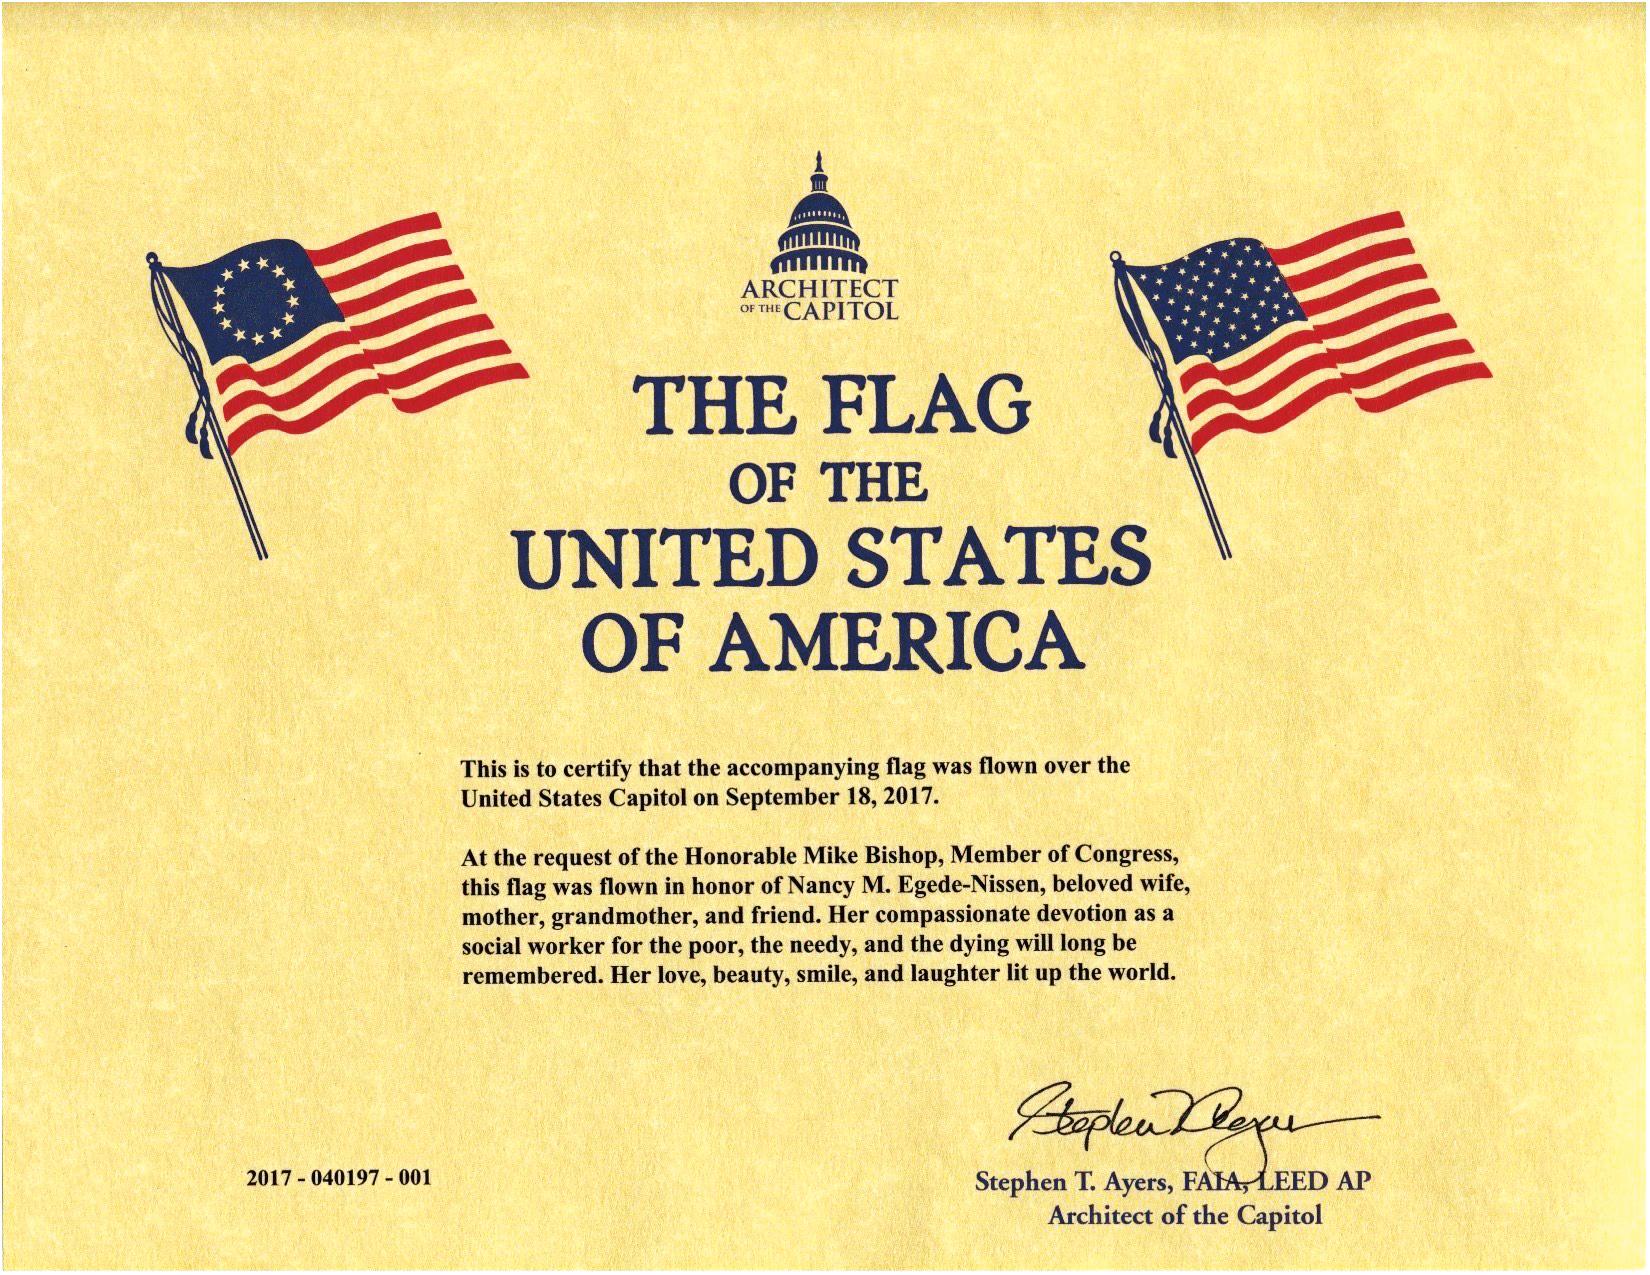 On September 18, 2017, a flag was flown over the U.S. Capitol in memory of Nancy Egede-Nissen, wife of Lars Egede-Nissen '58.